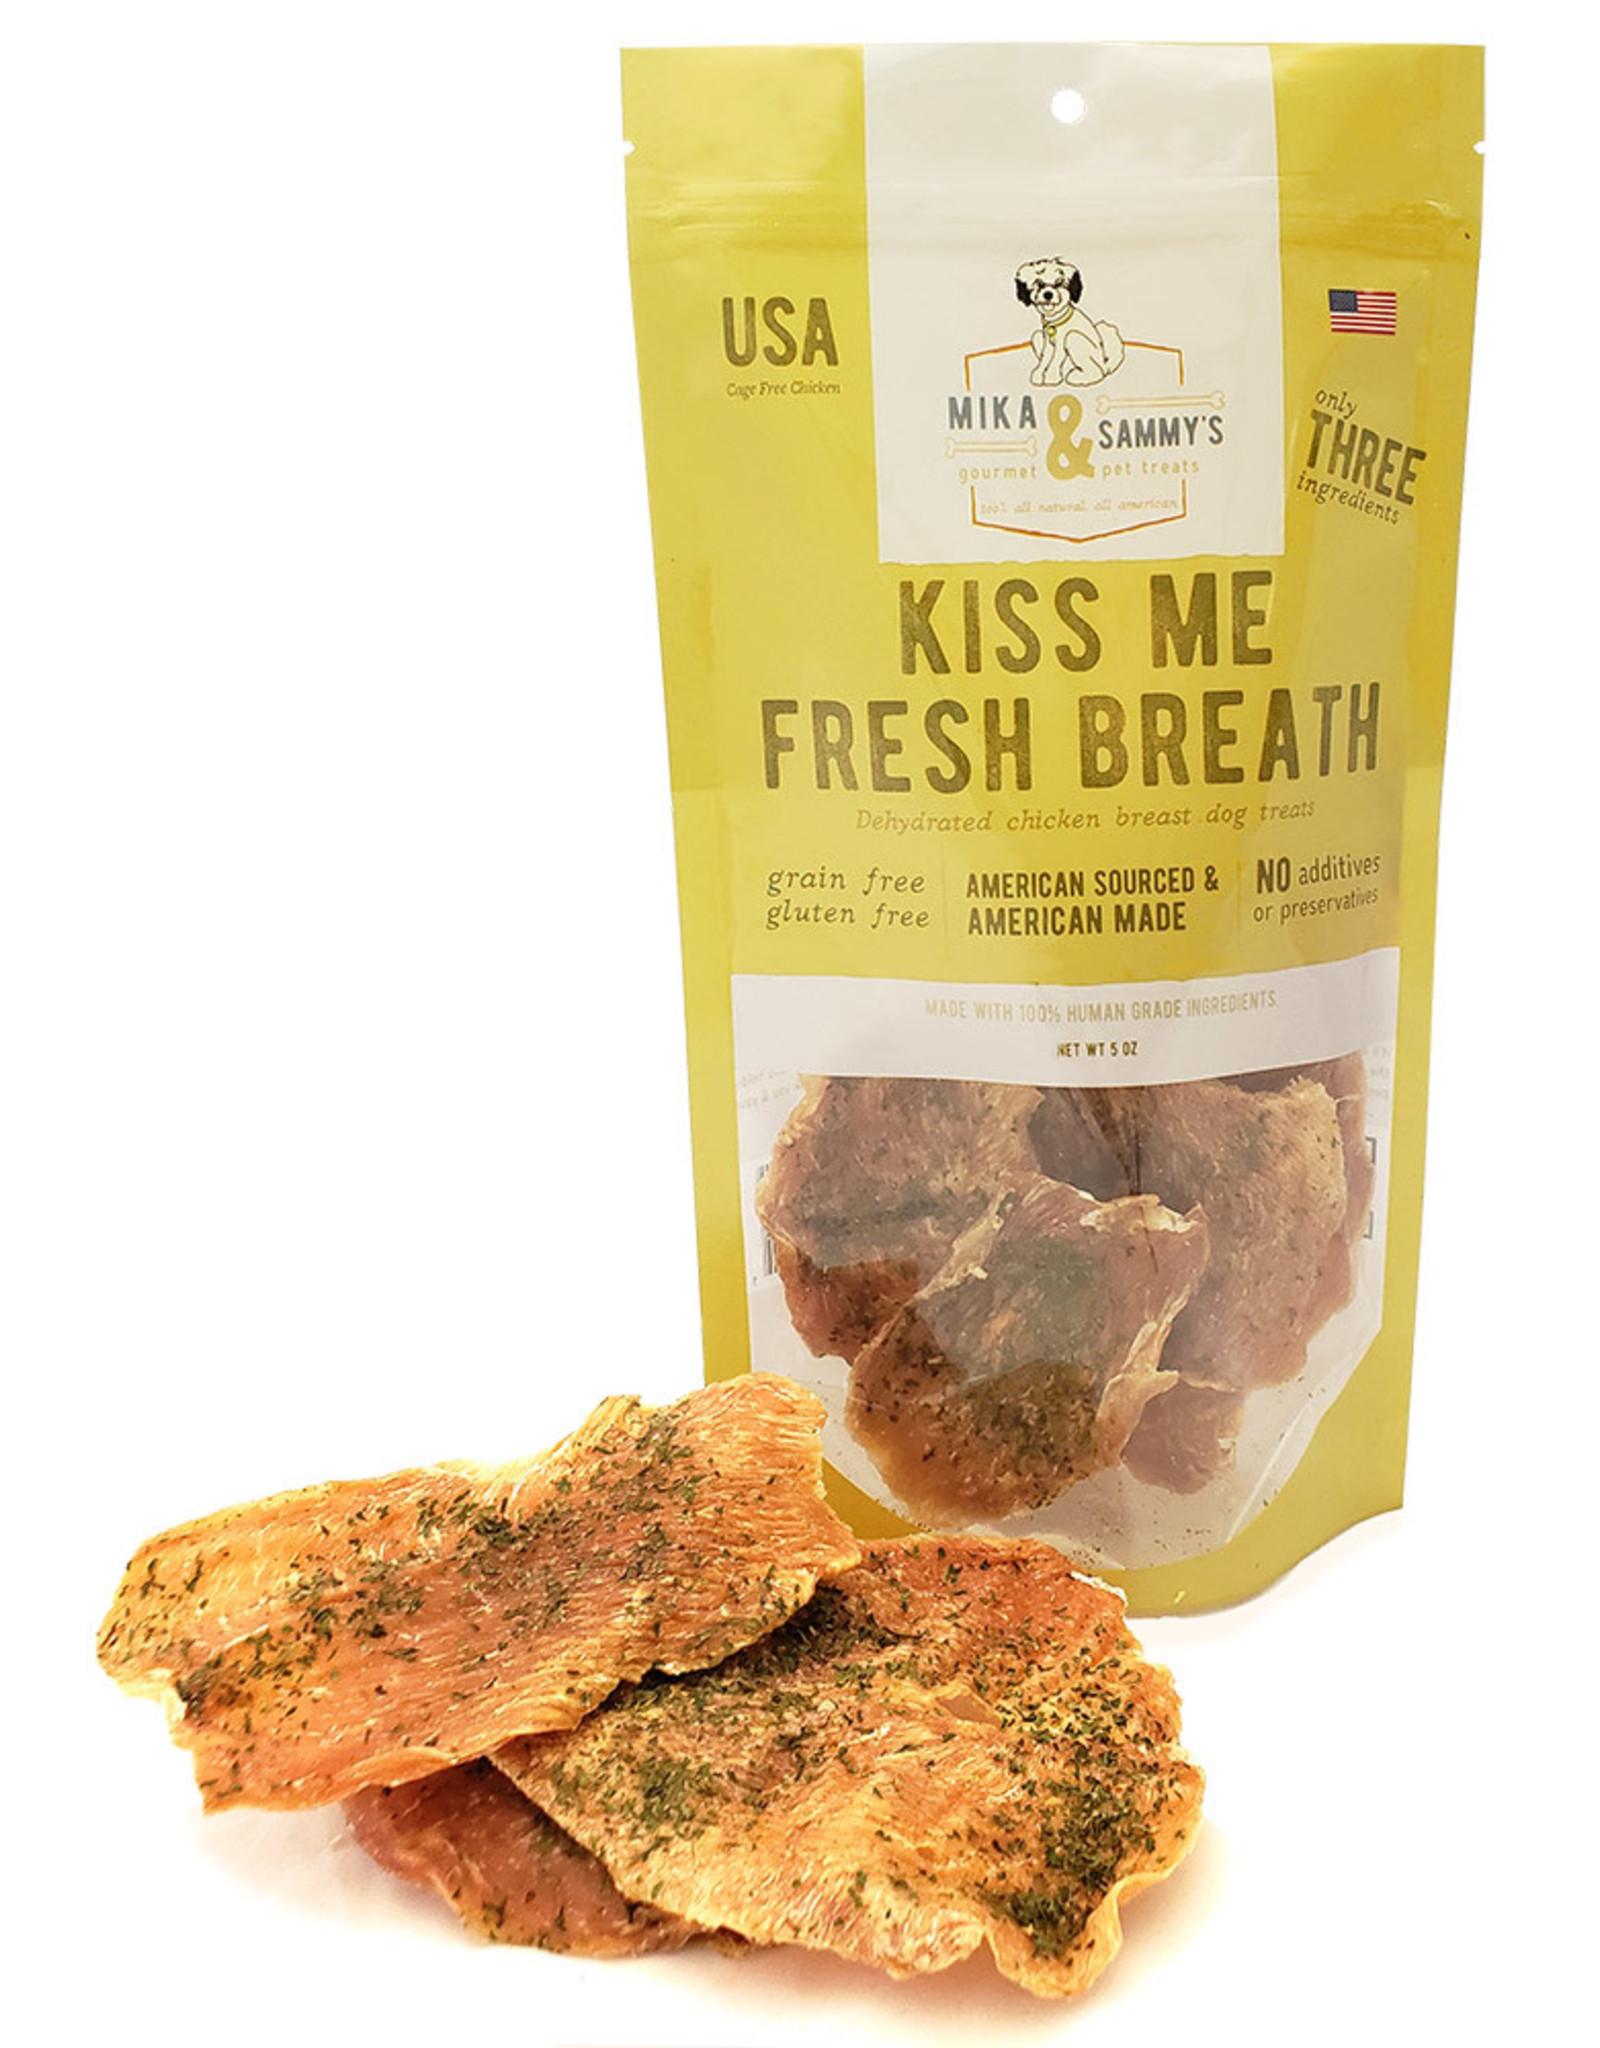 Mika & Sammy's Gourmet Pet Treats Mika & Sammy's: Kiss Me Fresh Breath, 5 oz